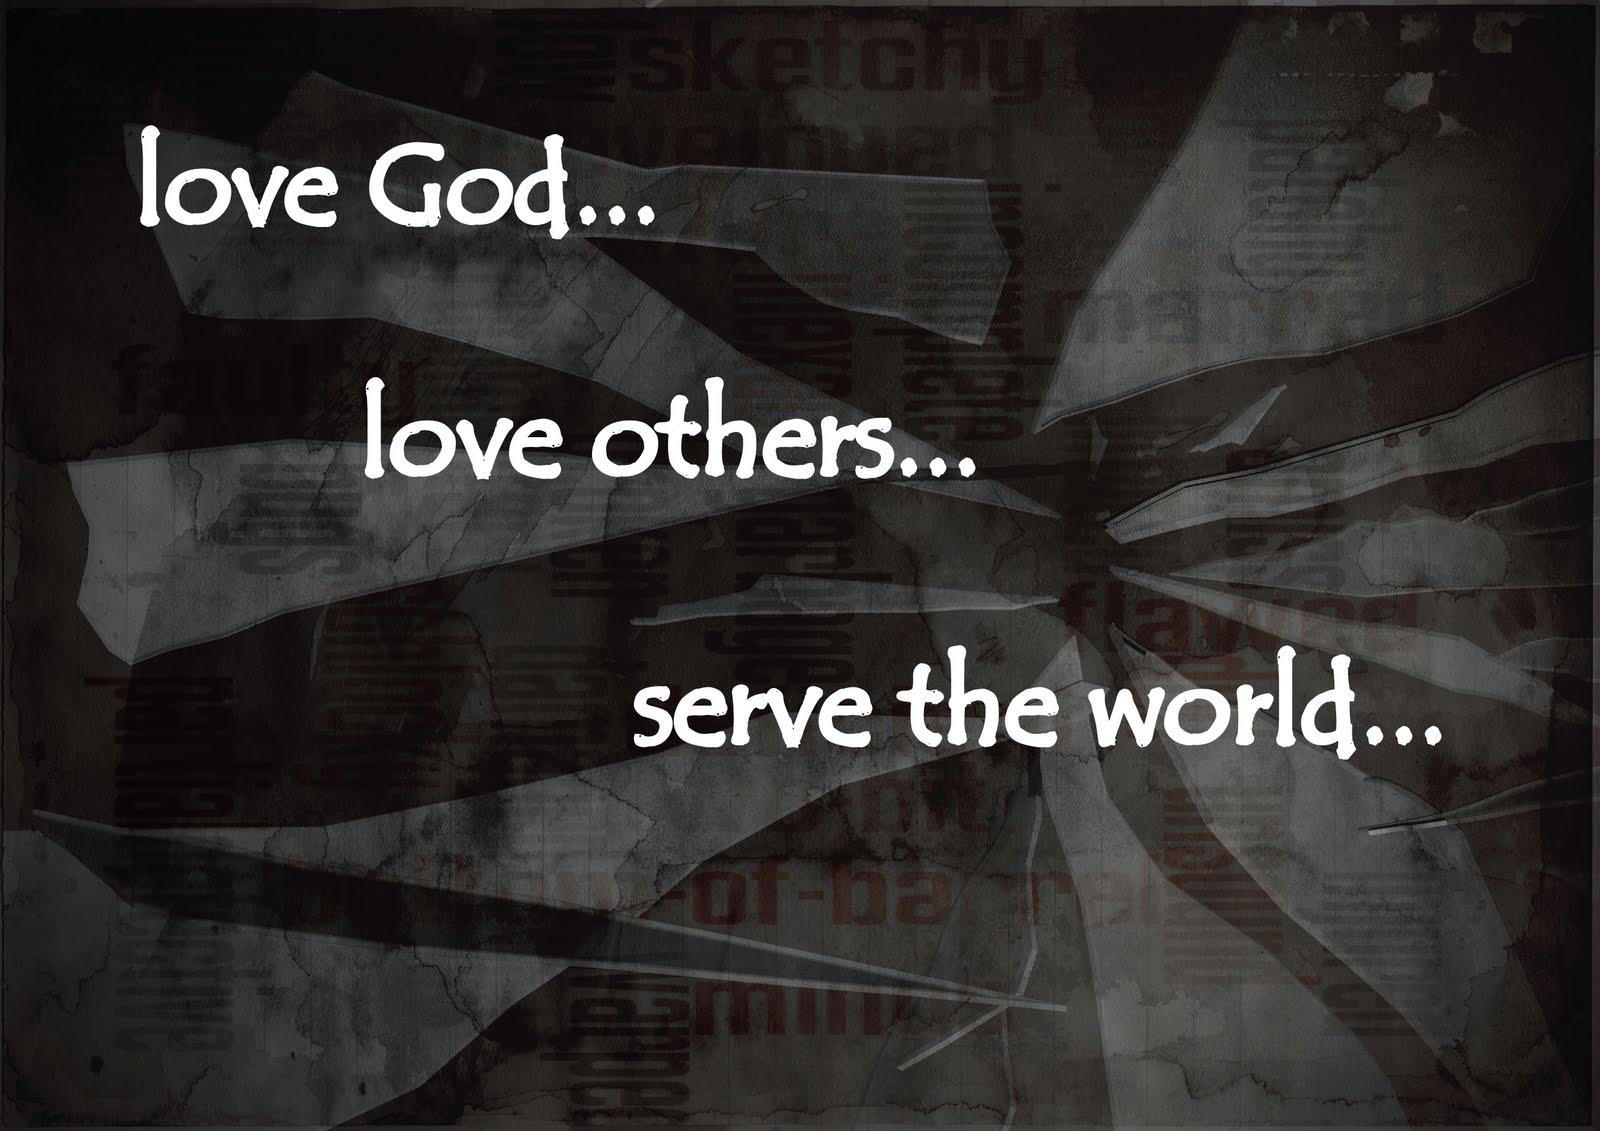 God Is Love Wallpaper Hd : God is Love Desktop Wallpaper - WallpaperSafari